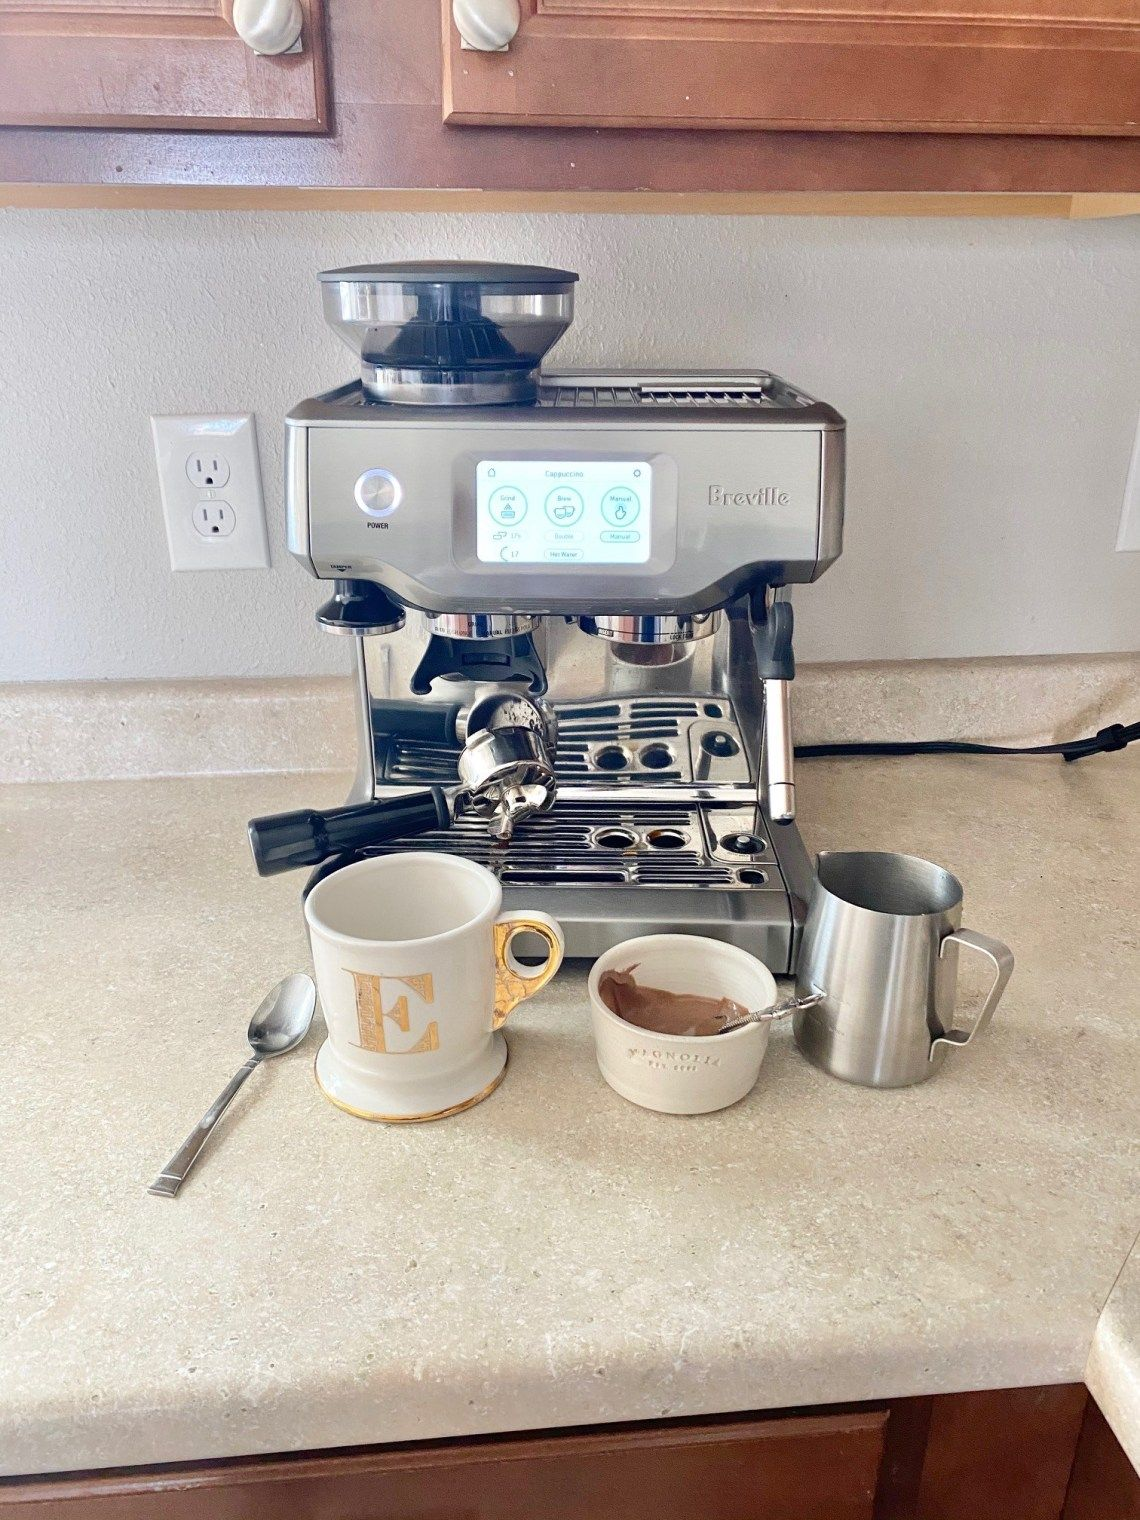 Breville Espresso Maker & Vegan Creamer Recipes House